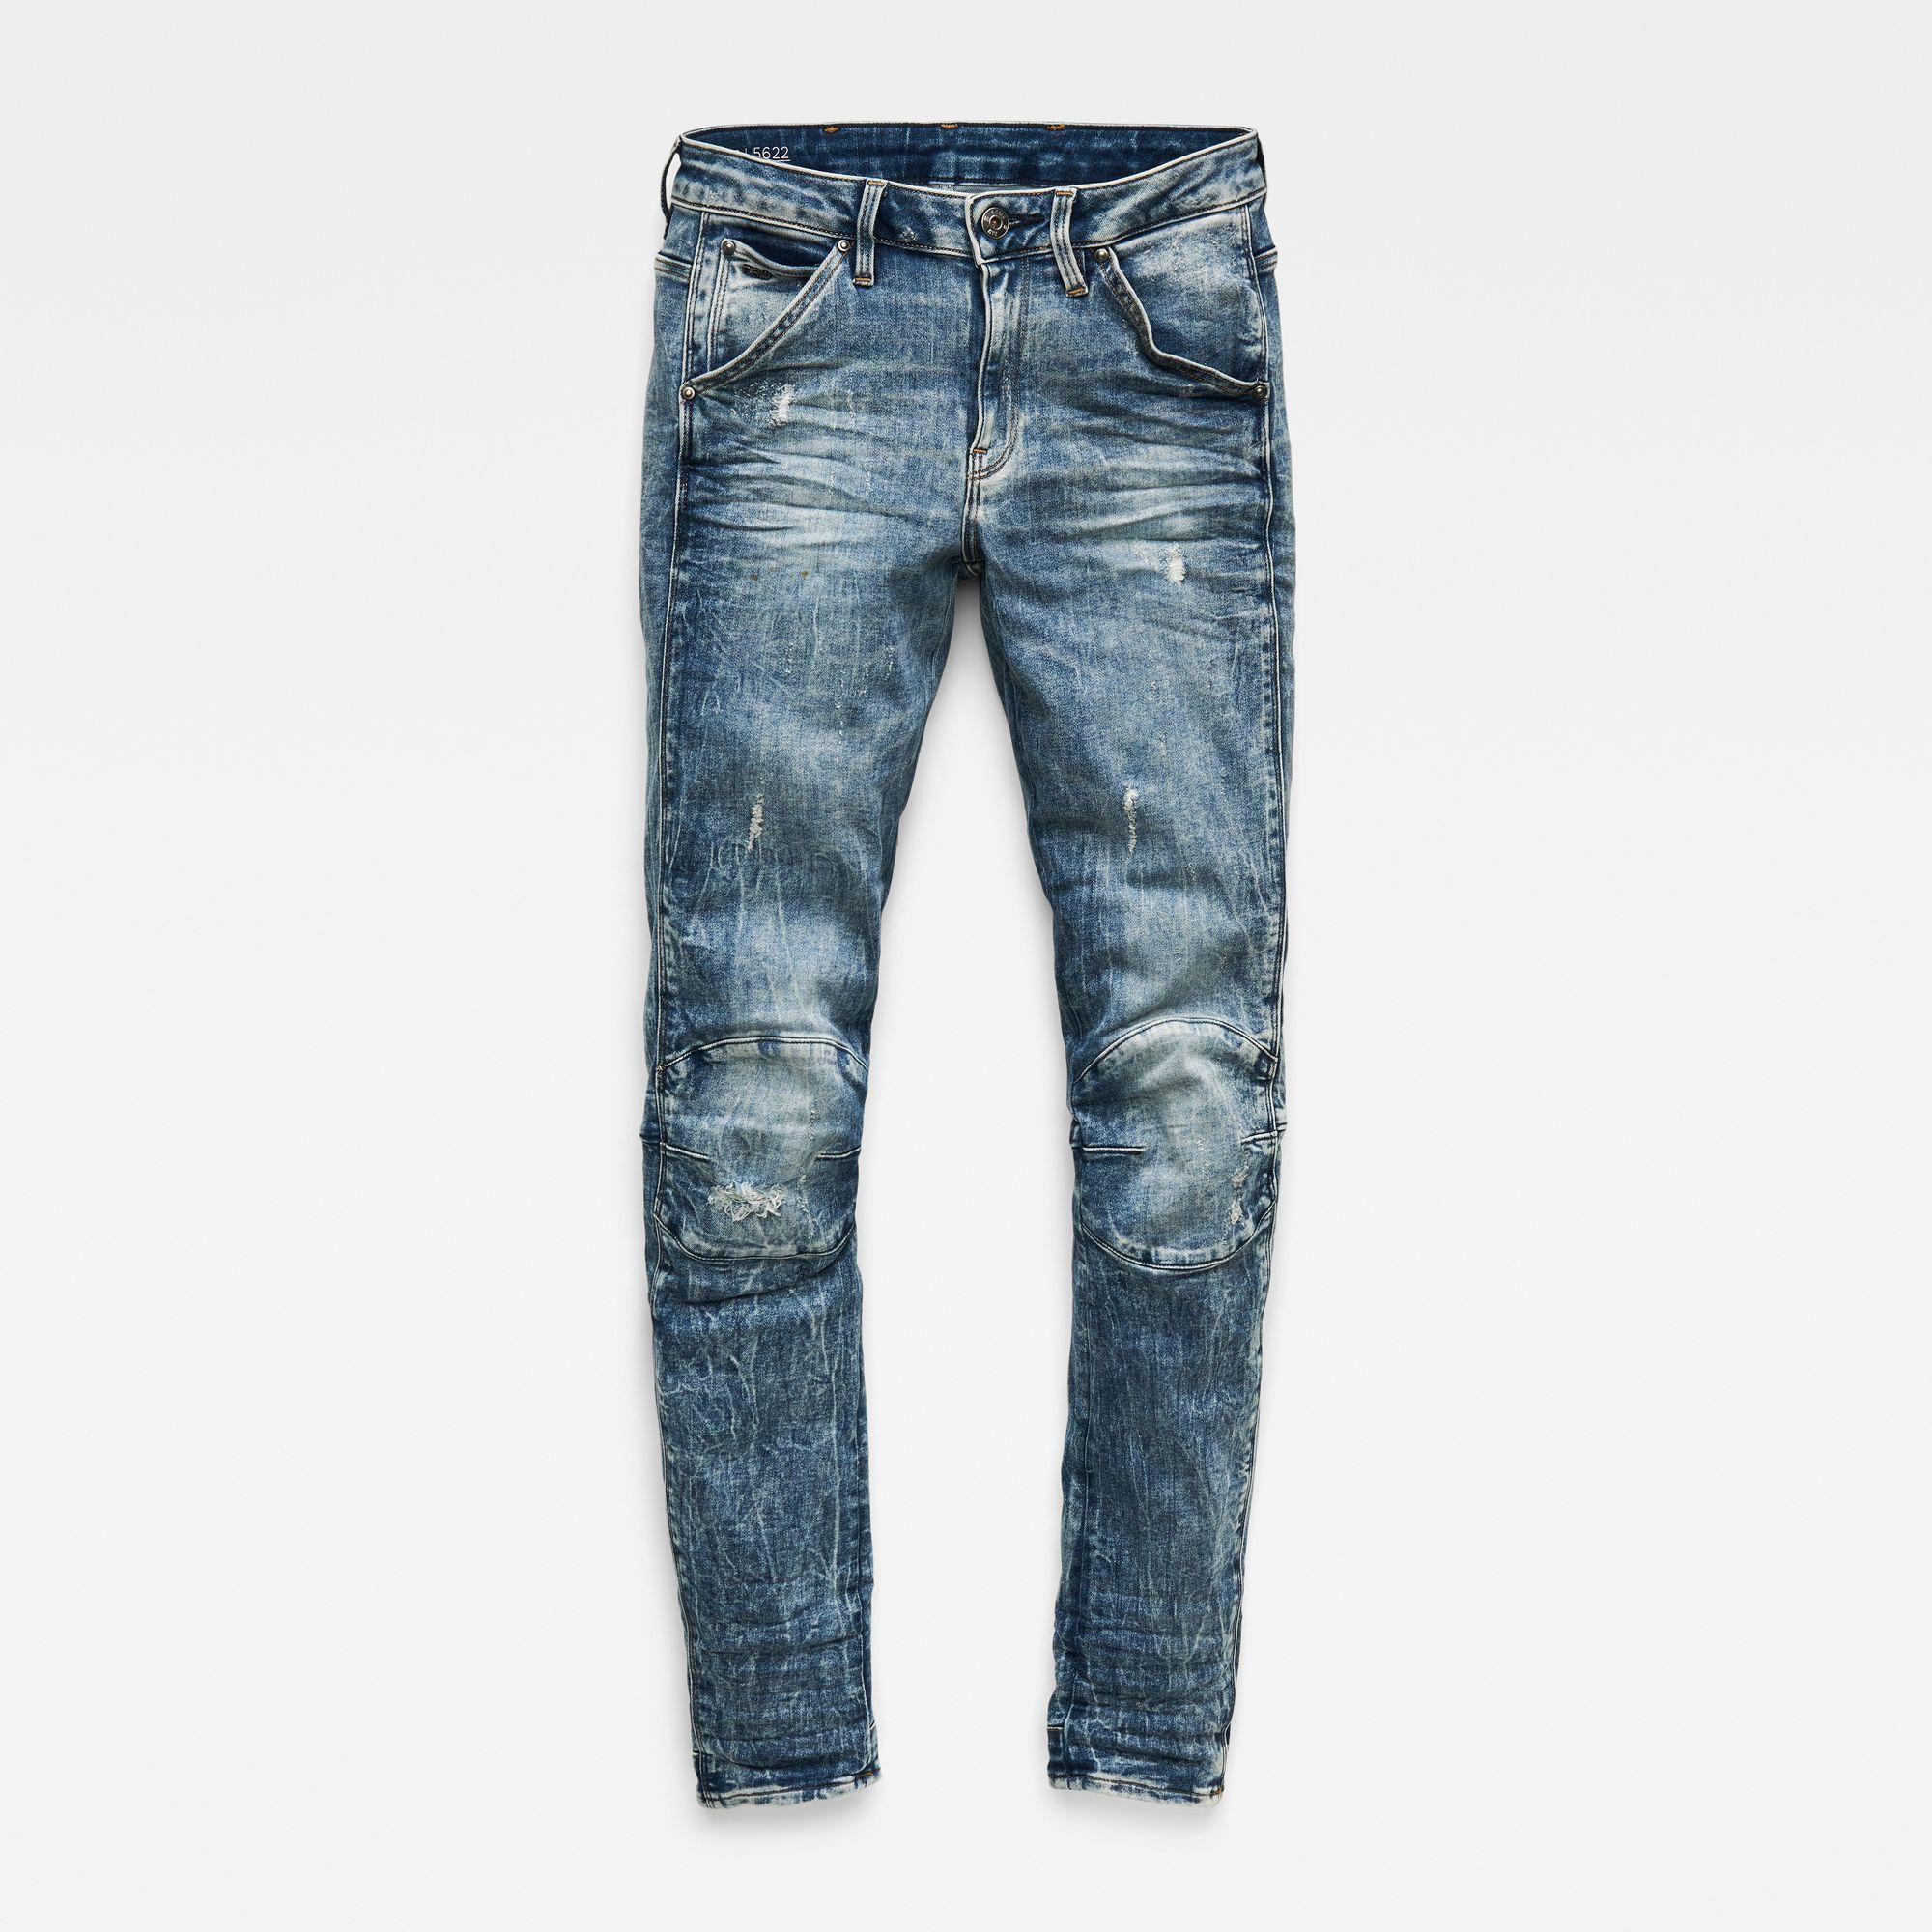 G-Star RAW 5622 Mid-Waist Skinny Jeans